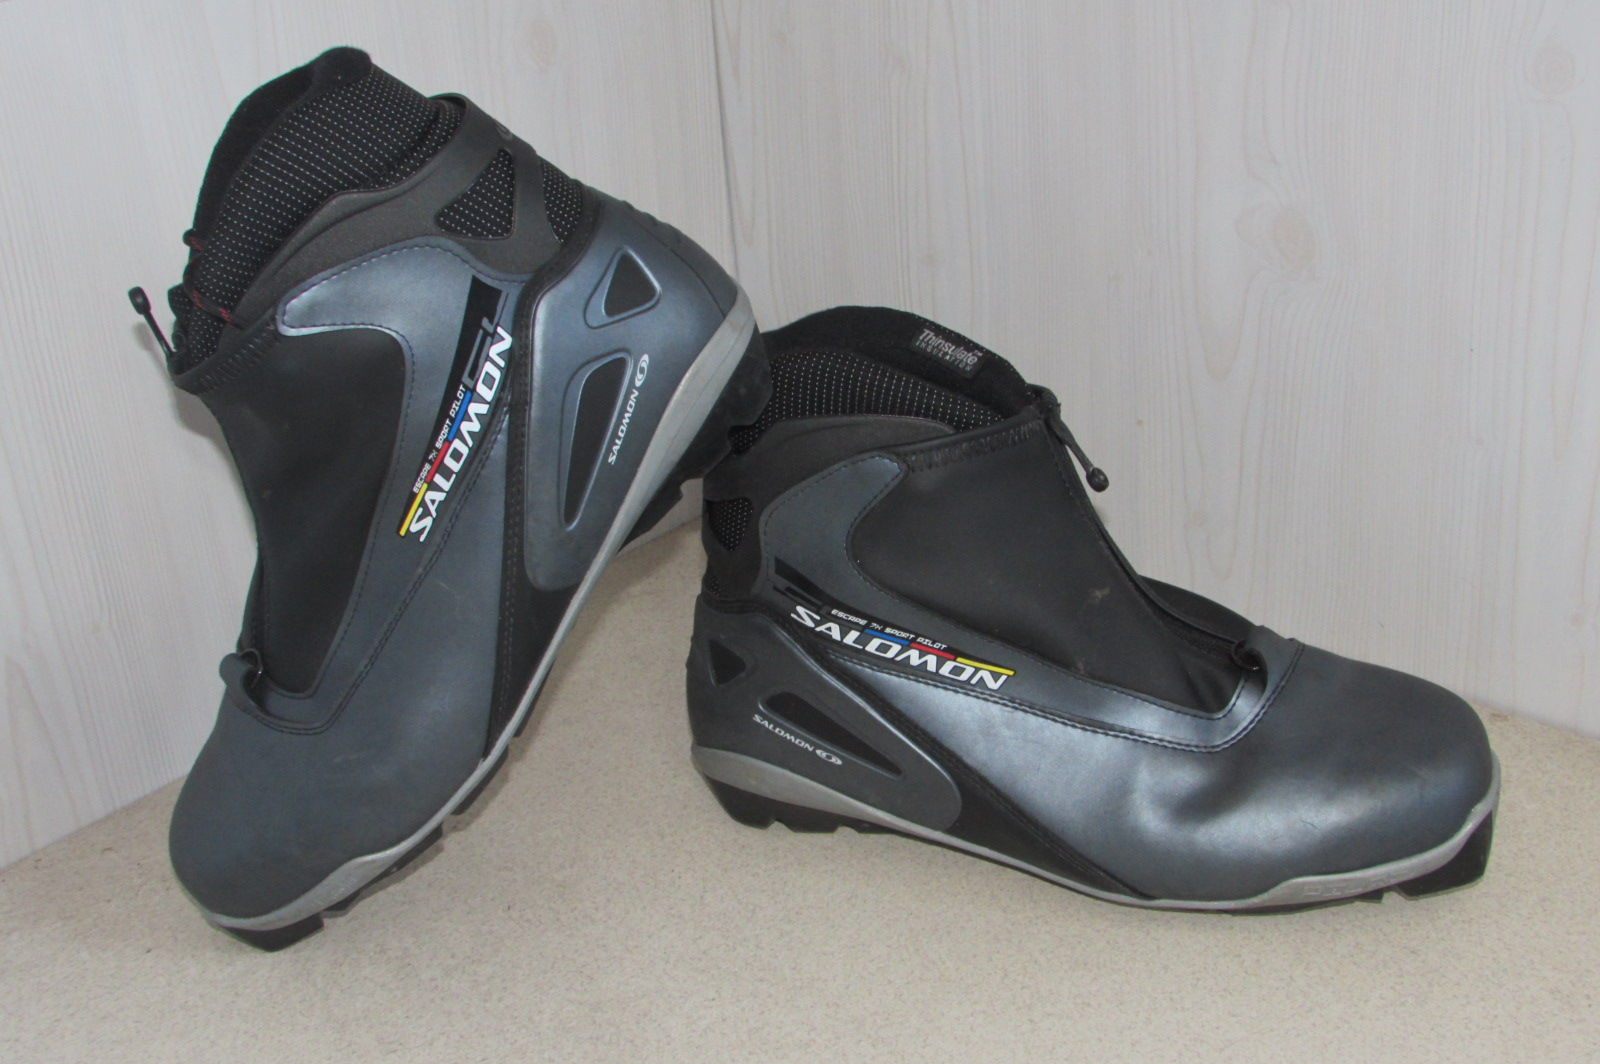 Buty biegowe SALOMON SNS PILOT Eu.46 (nr1)